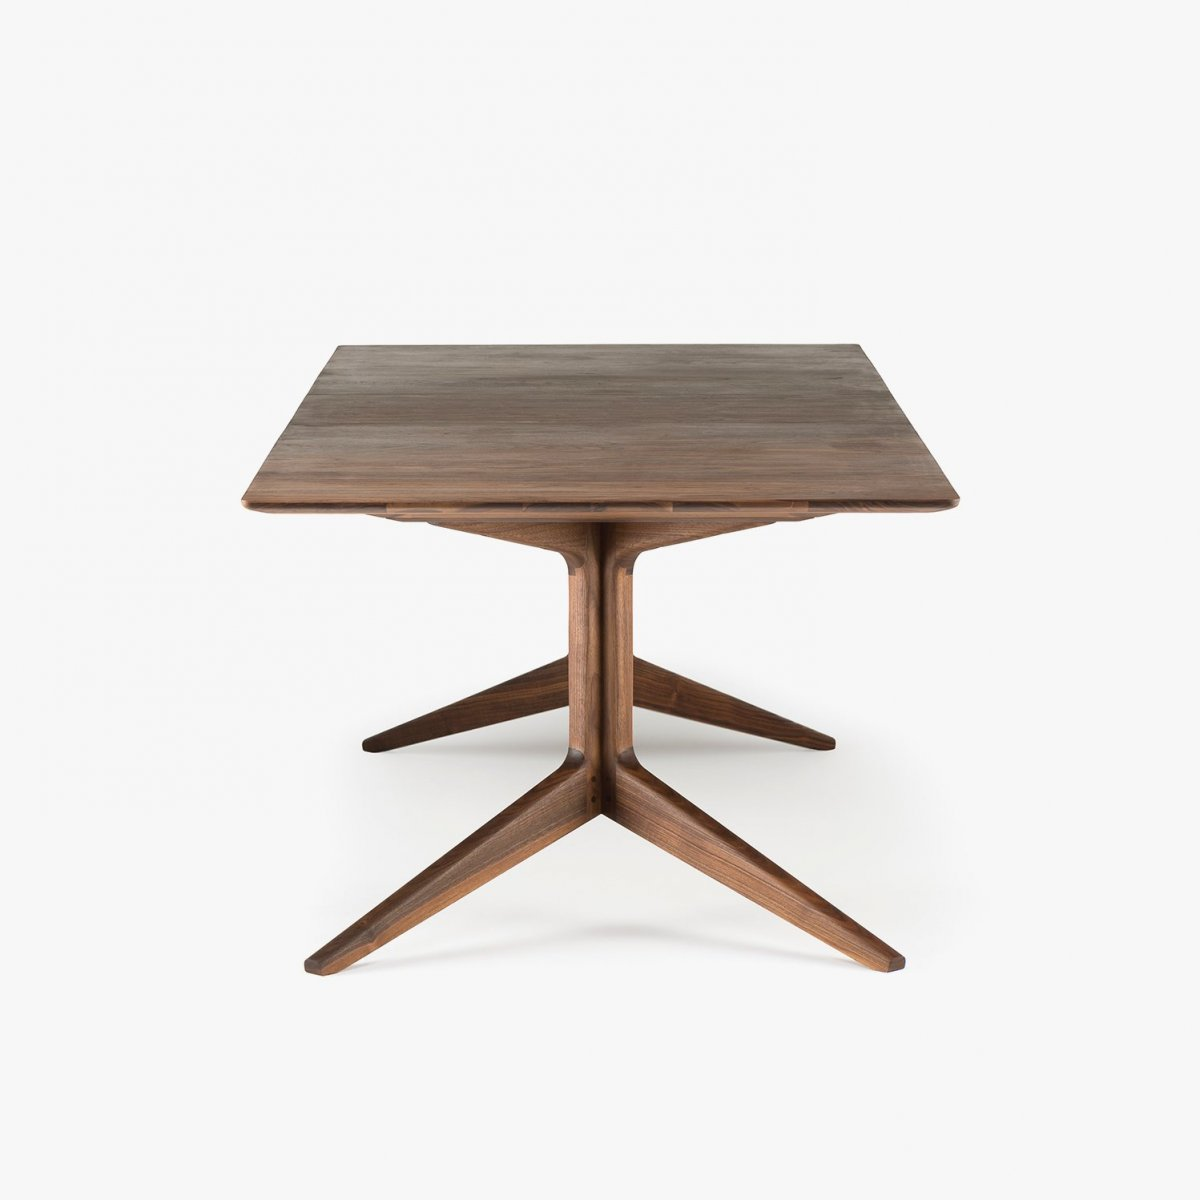 341E Light Extending Table in Danish oiled walnut, side view.